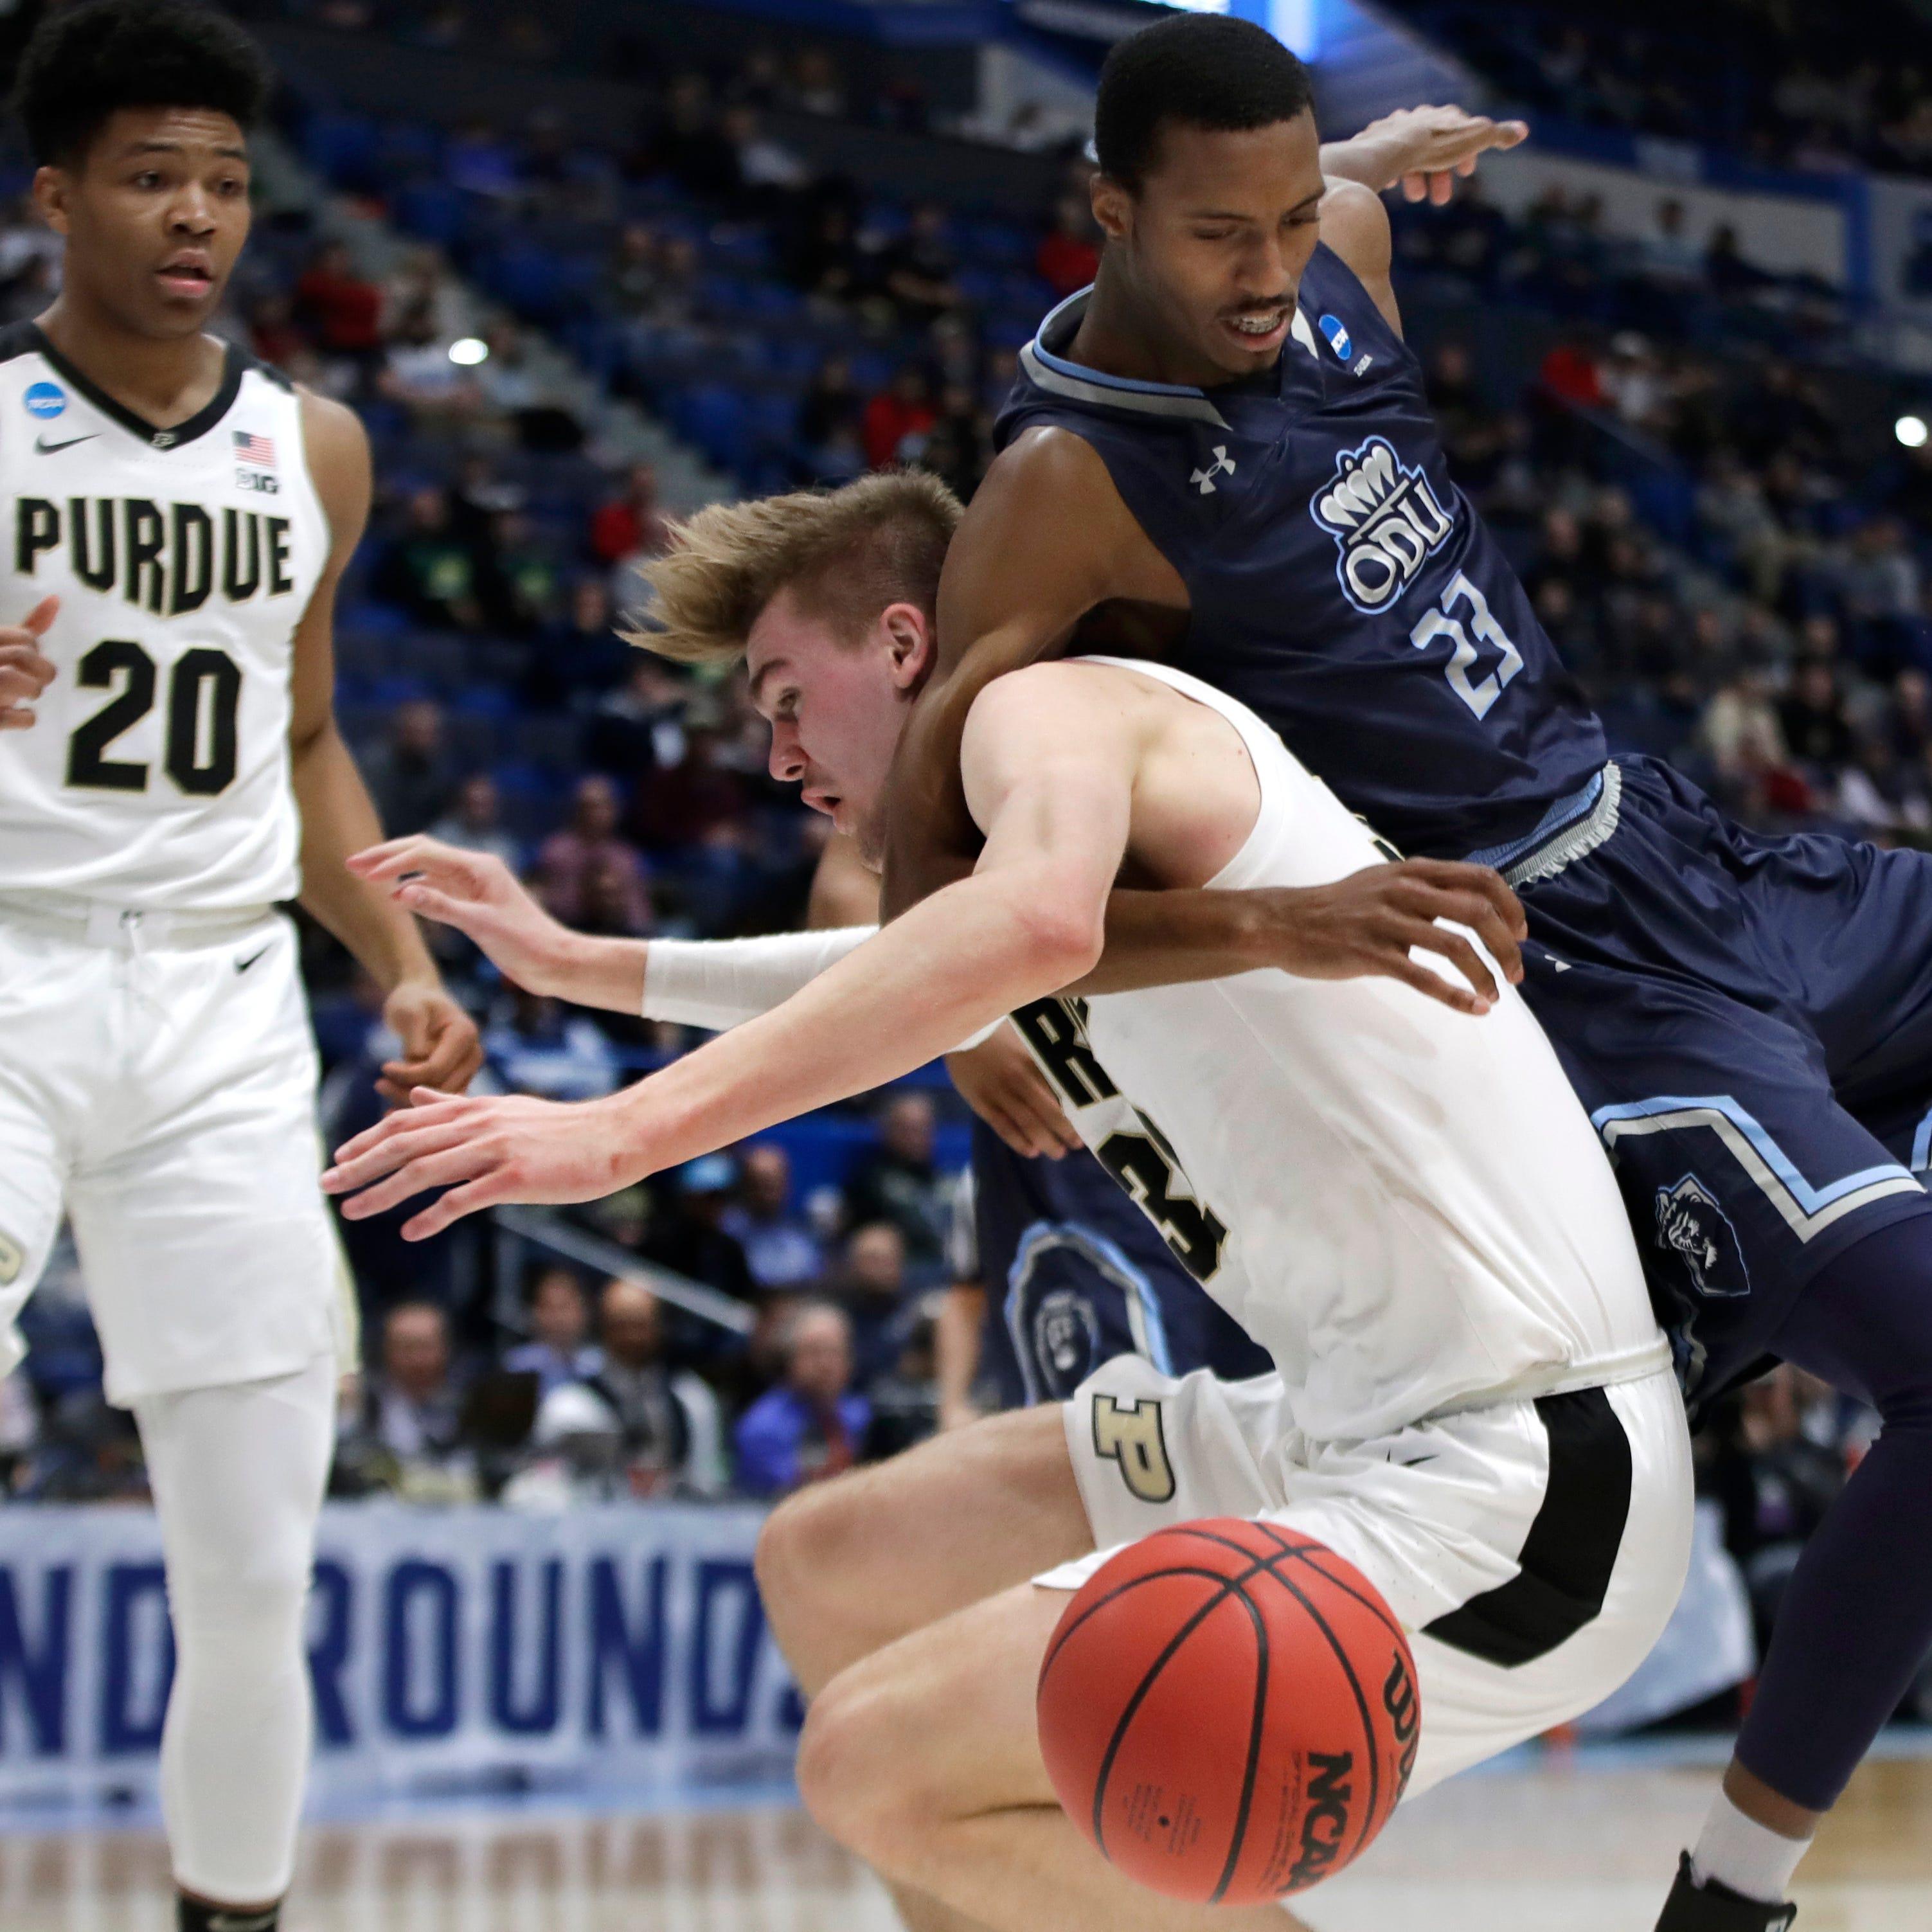 March Madness 2019: Purdue's Nojel Eastern 'full go' for Saturday against Villanova